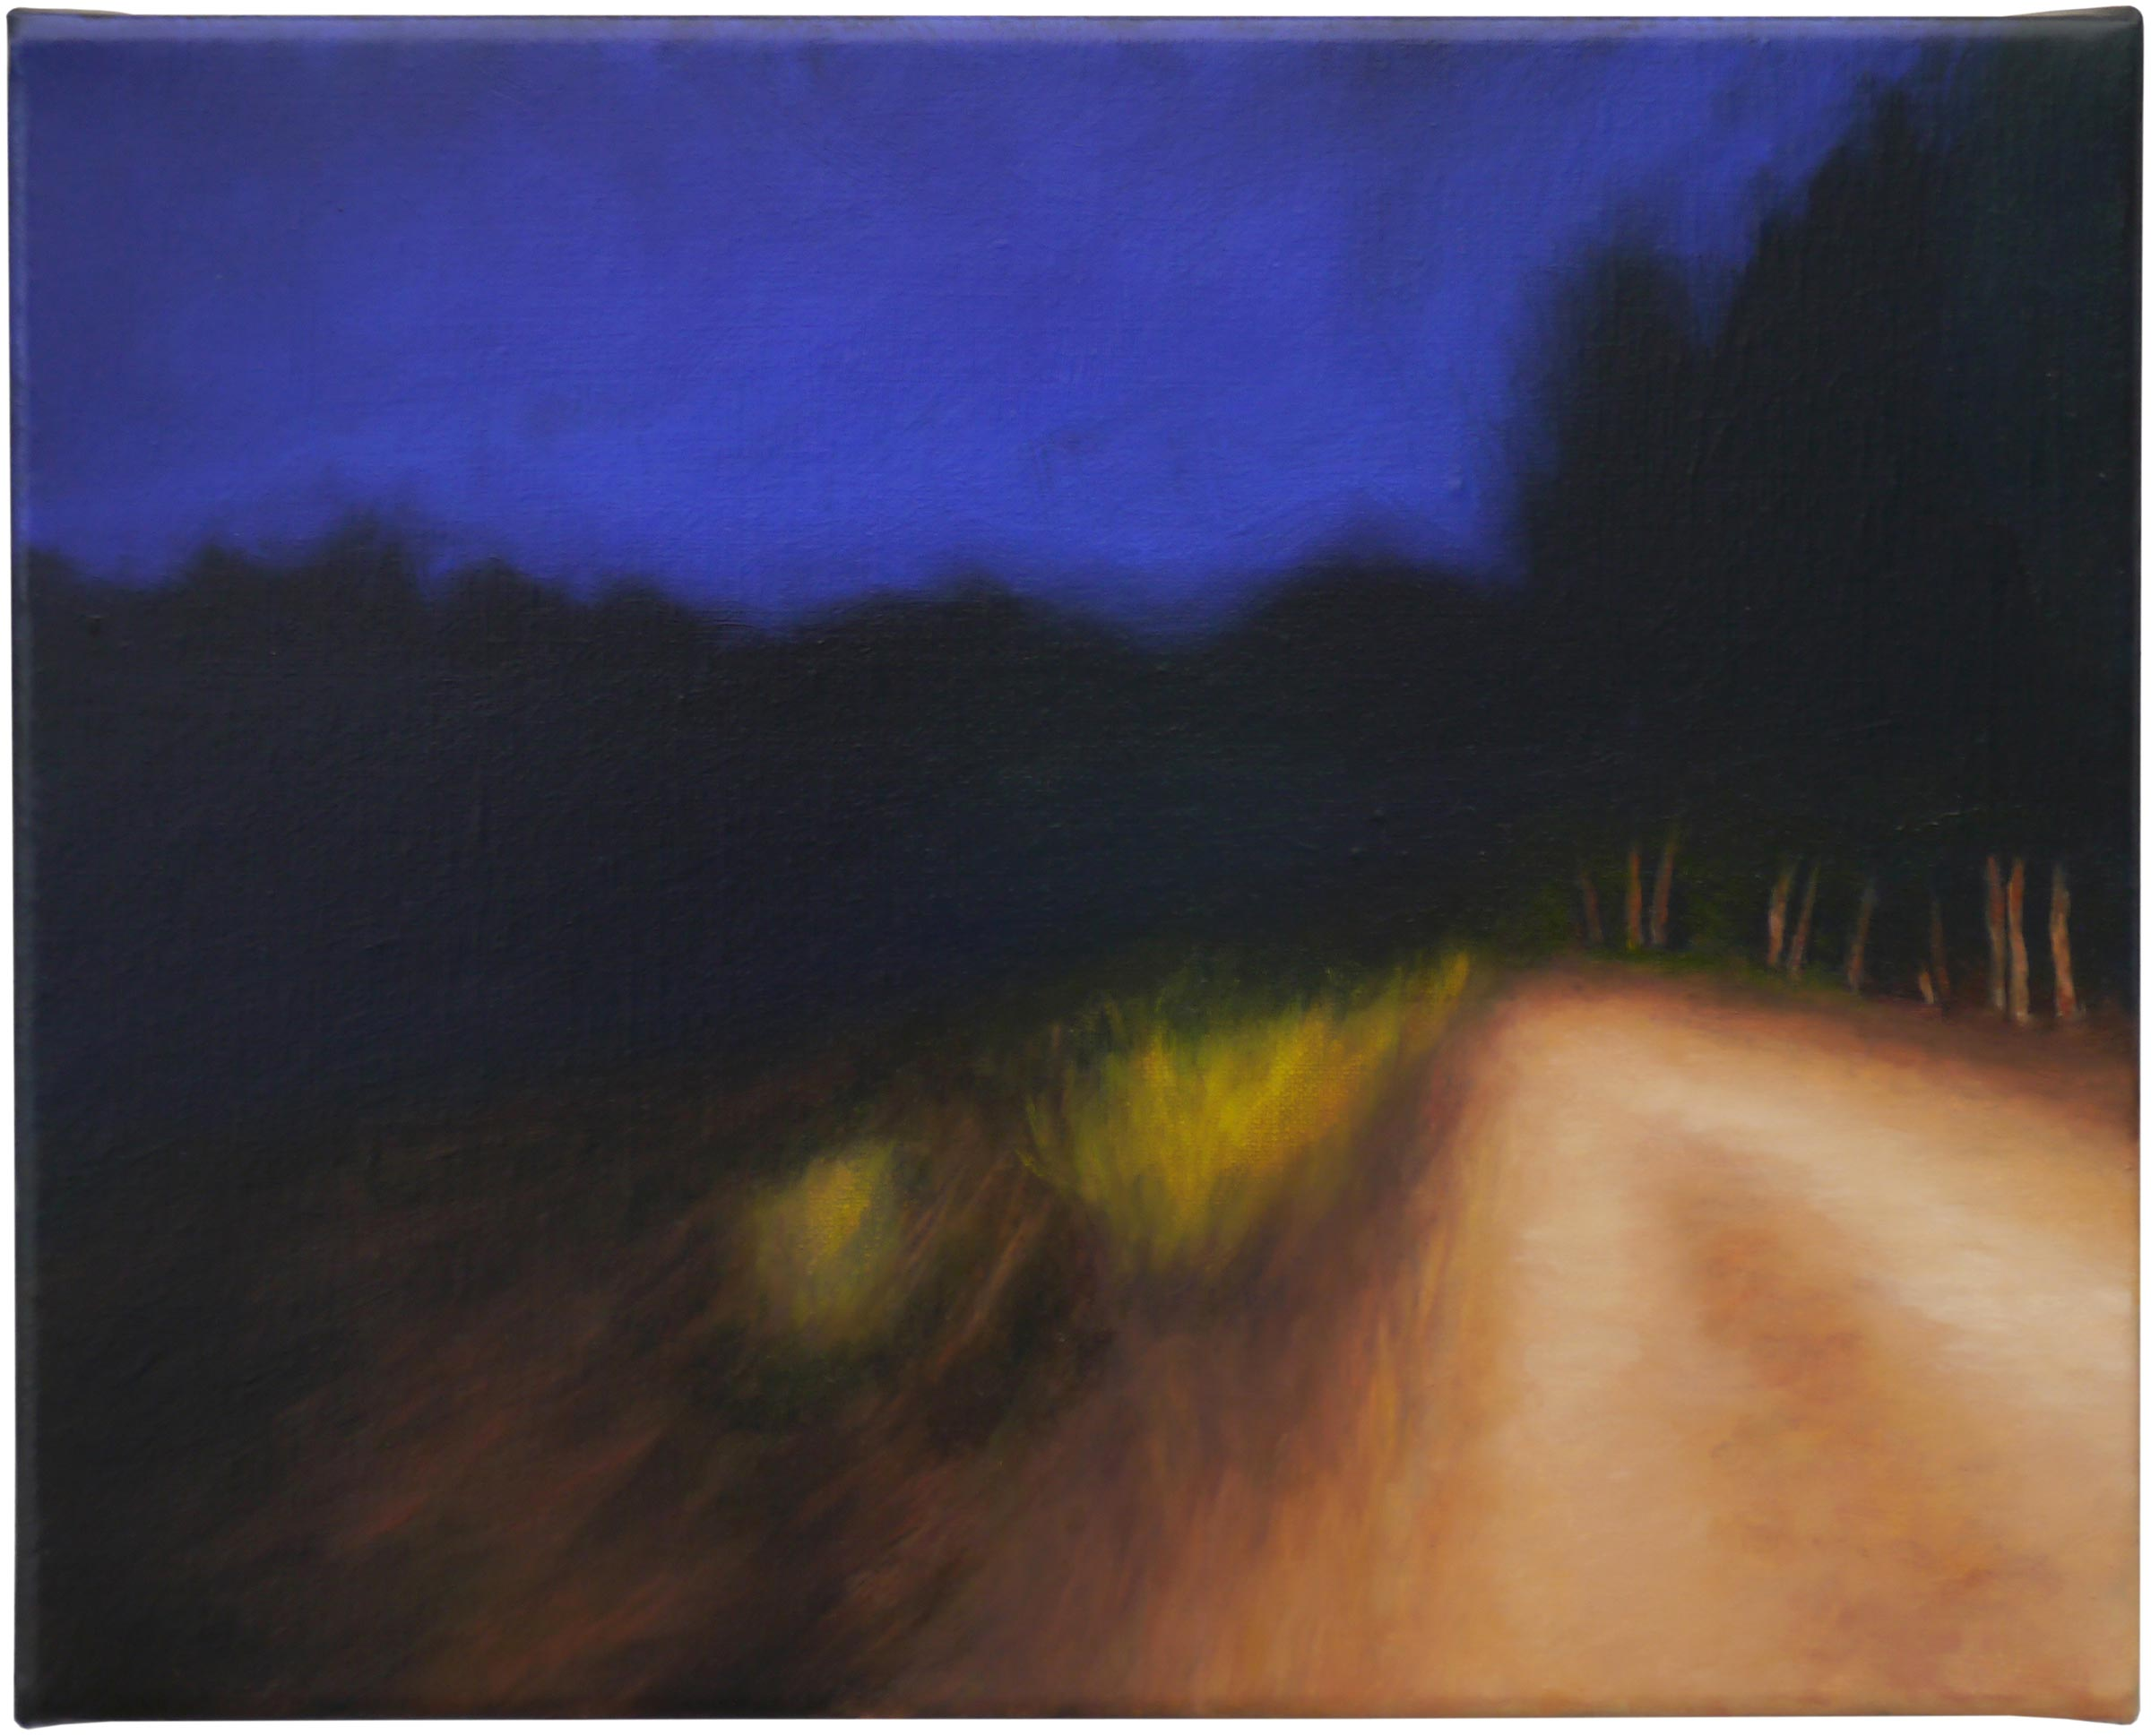 The shadows beyond 2, oil on linen, 30cm x 24cm, 2021